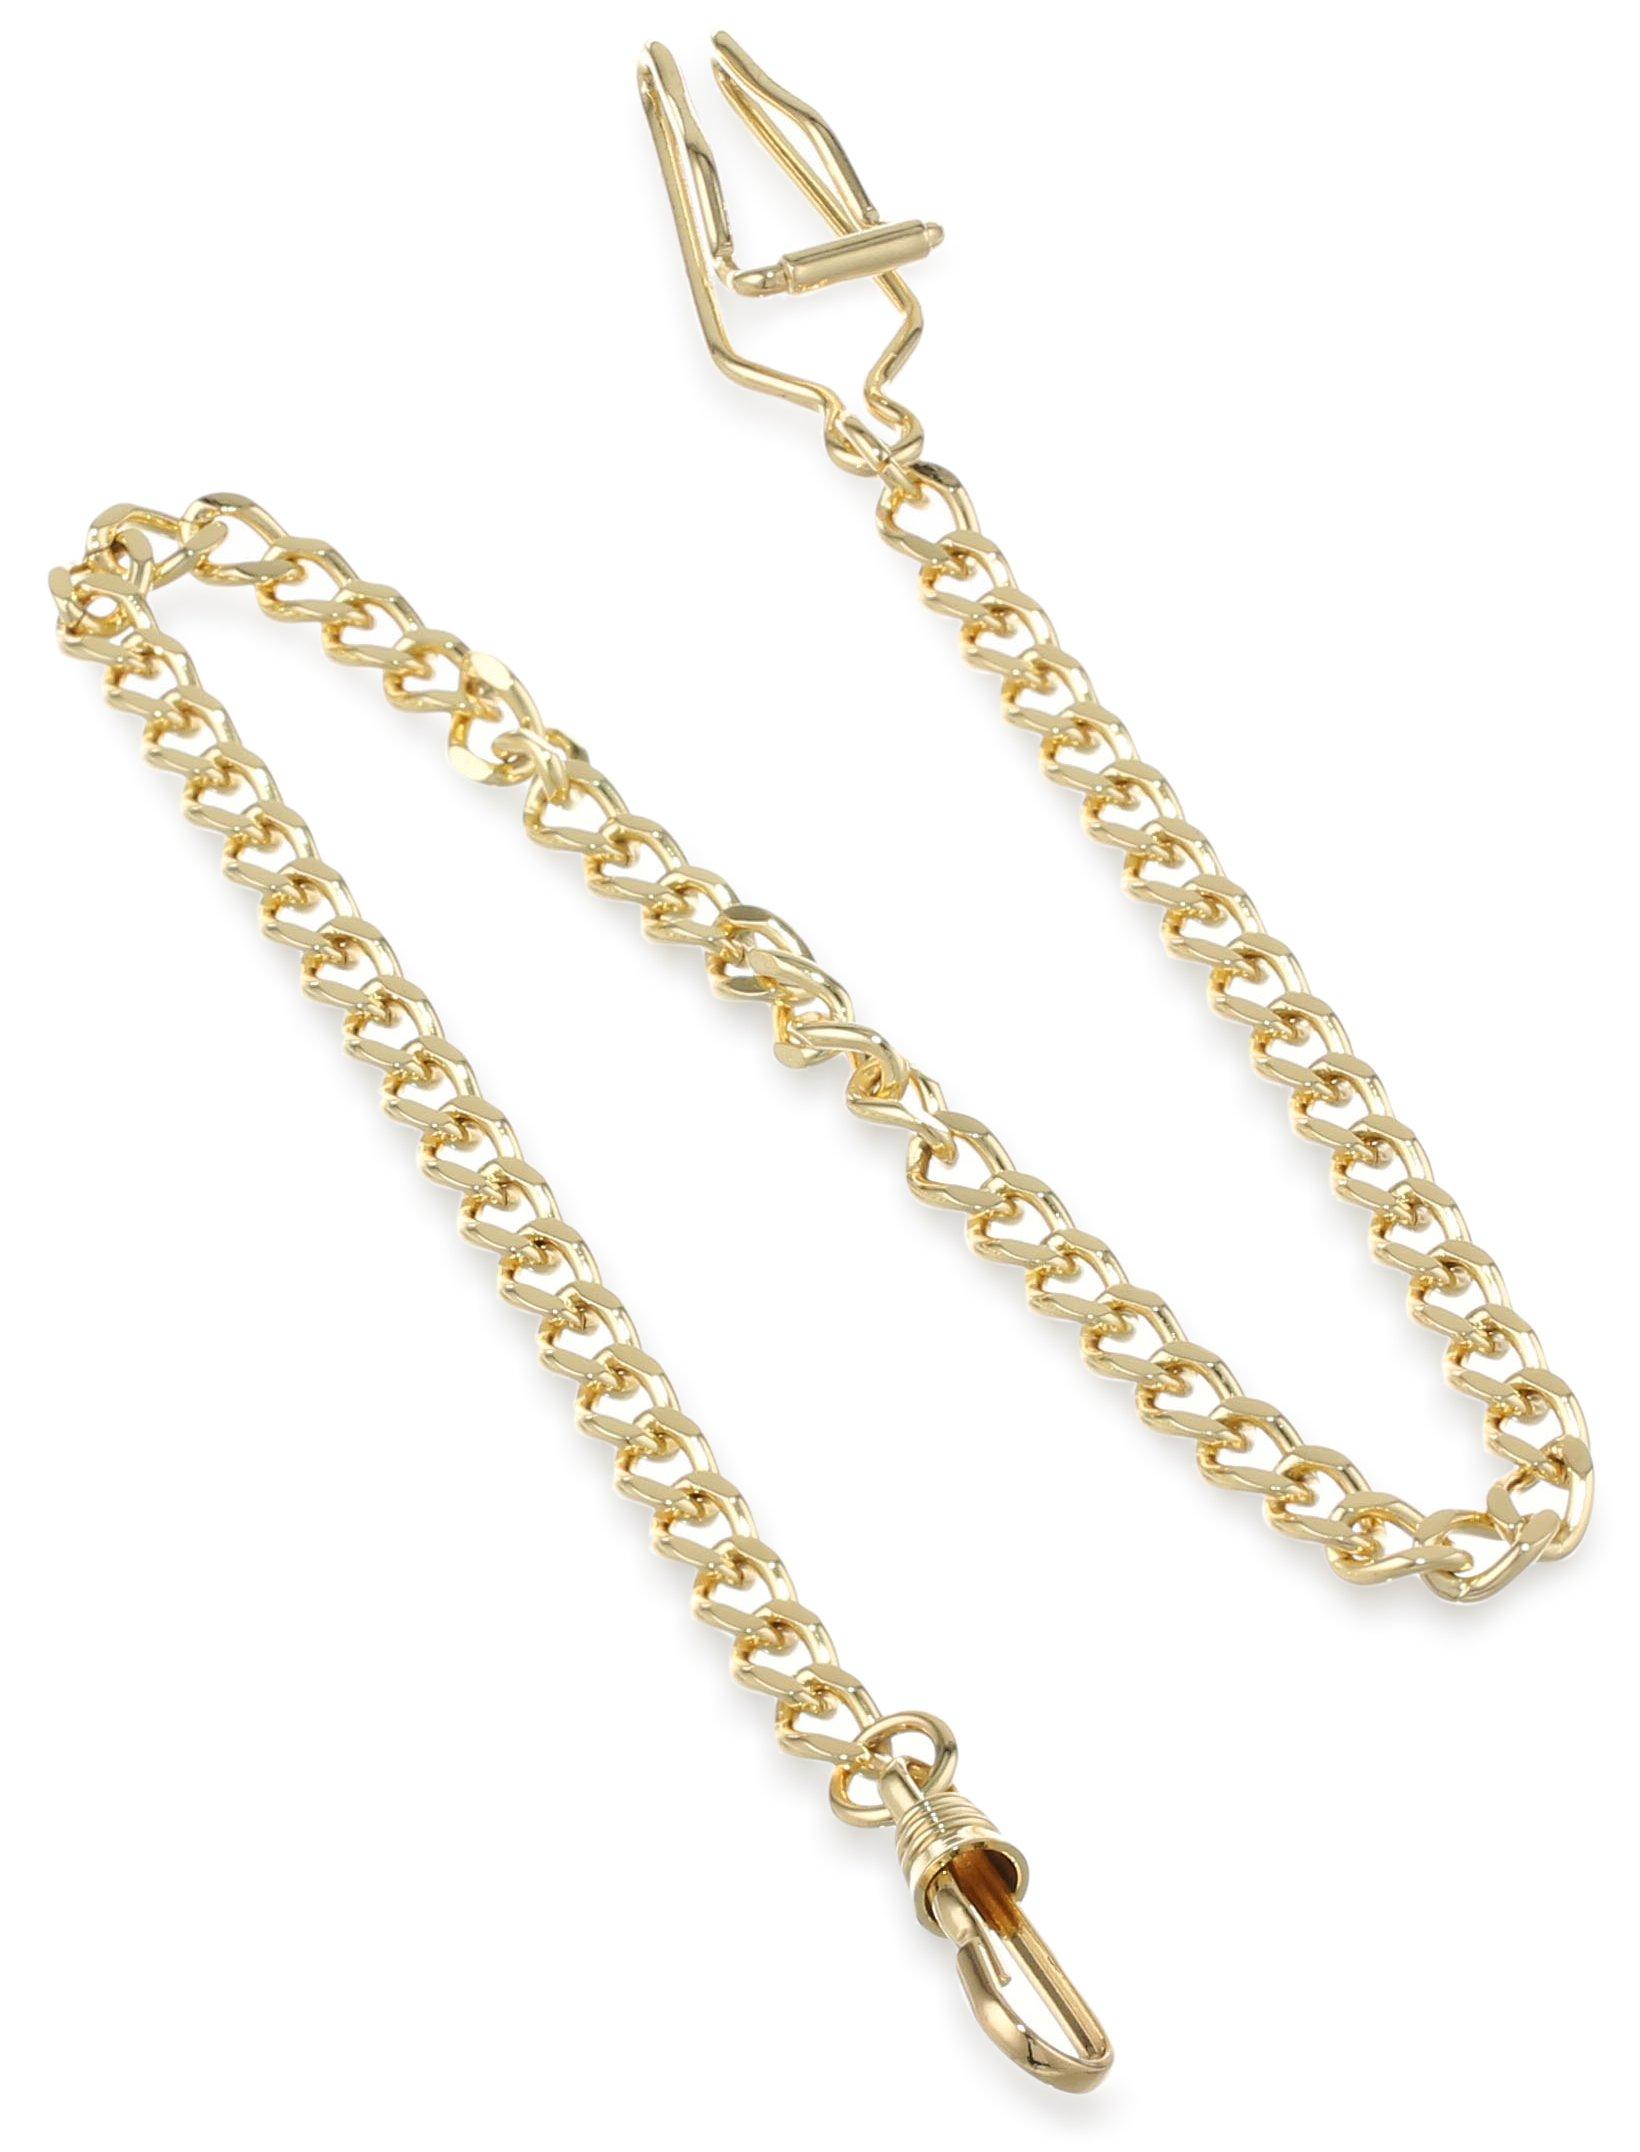 Charles-Hubert, Paris 3547-G Gold-Plated Pocket Watch Chain by CHARLES-HUBERT PARIS